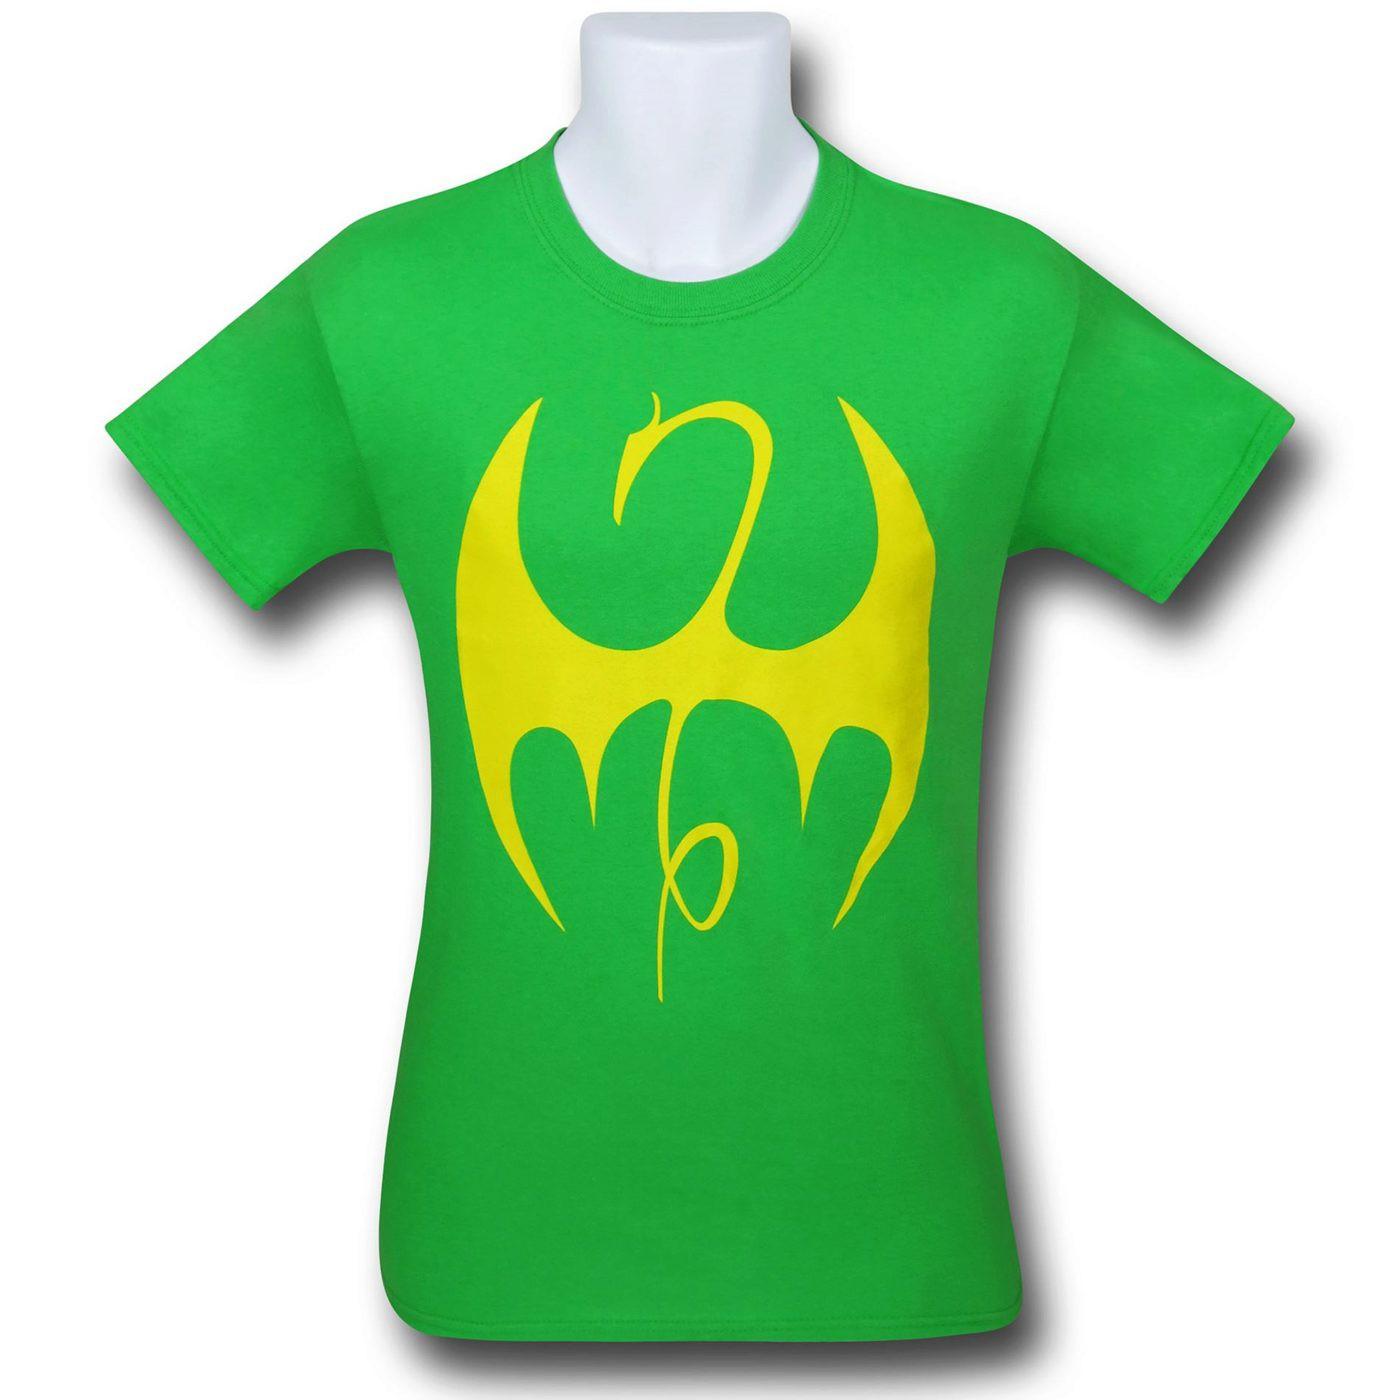 Iron Fist Symbol T-Shirt